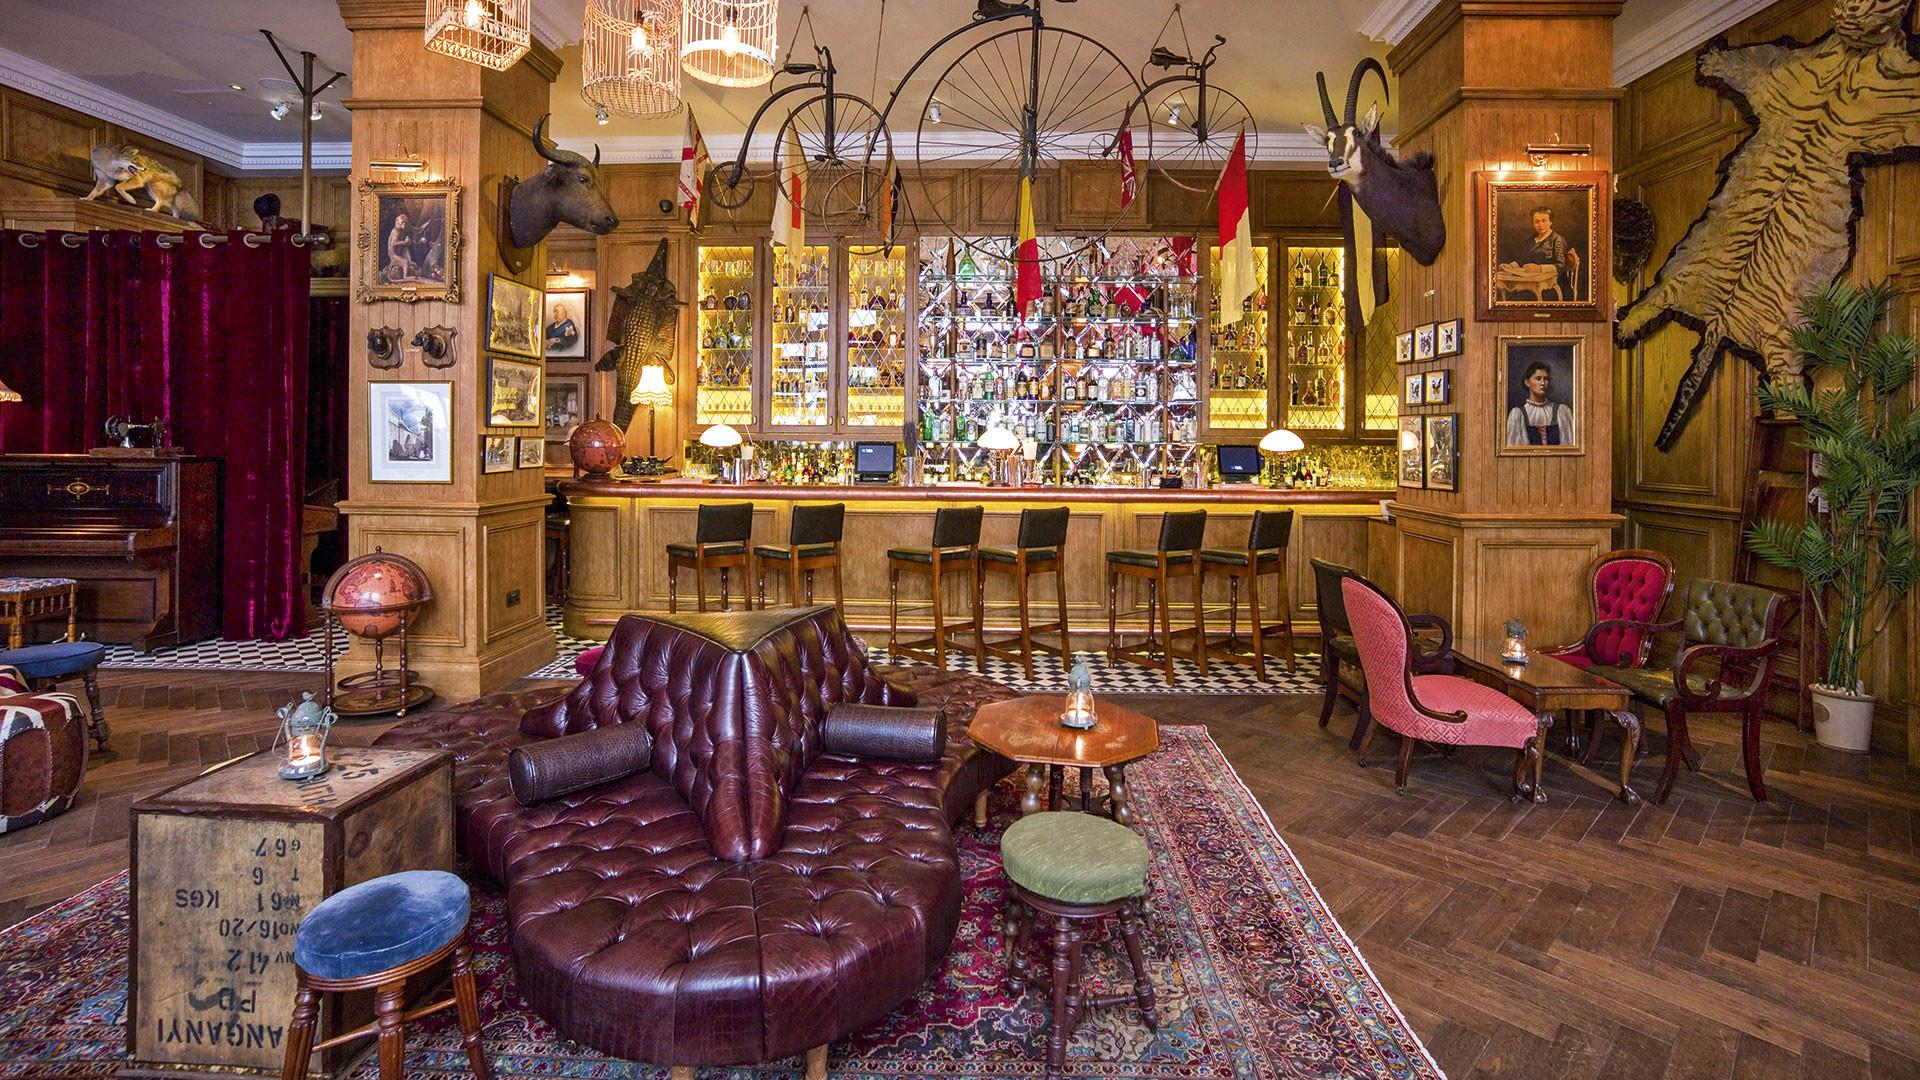 Mr Fogg's safari camp at Taste of London 2016